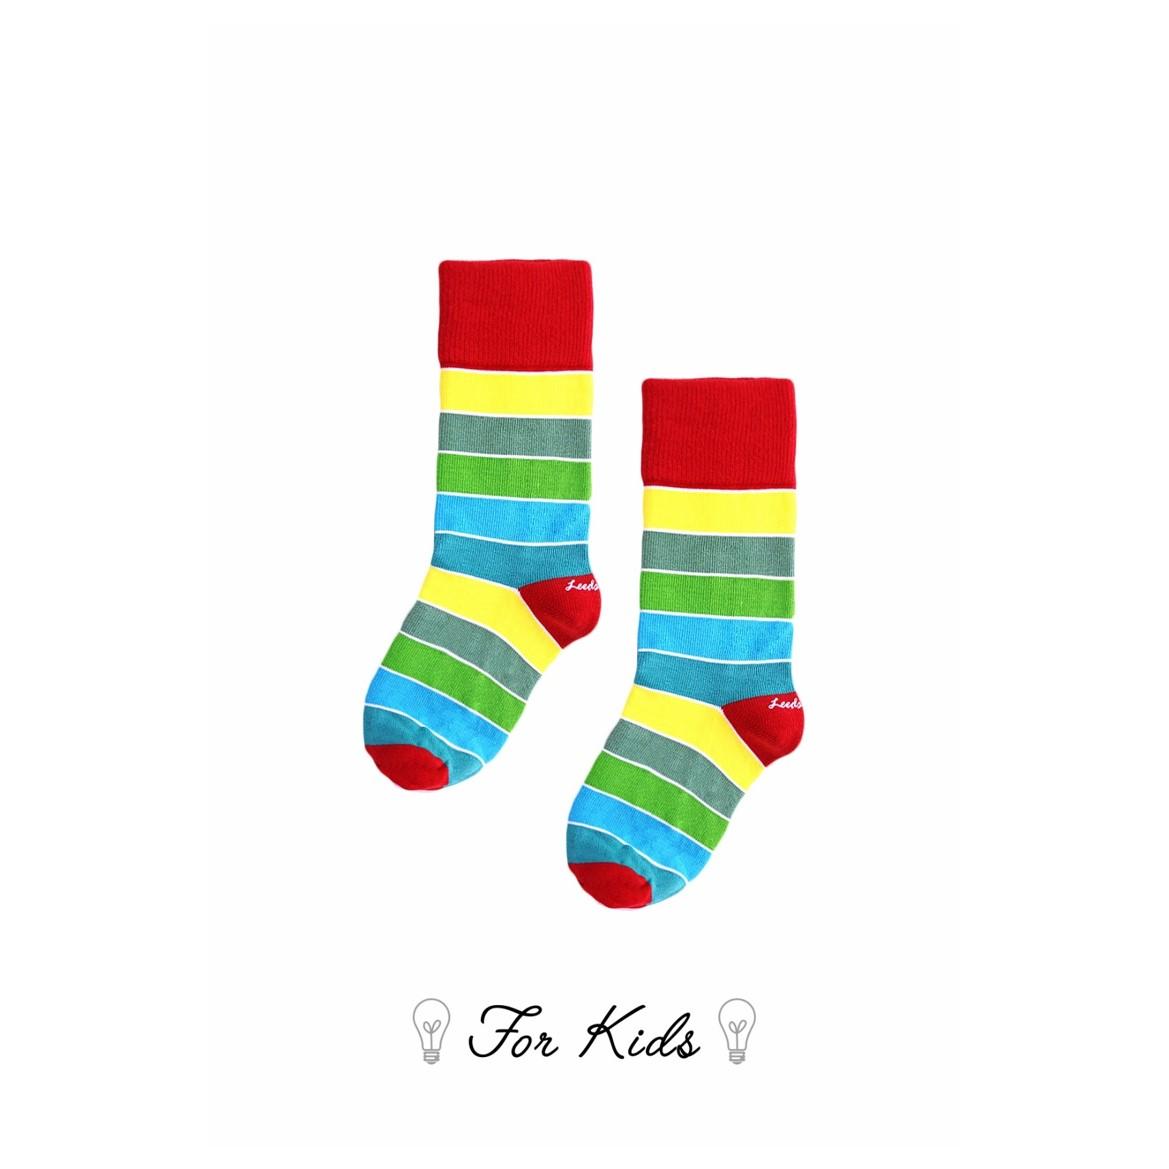 Leeds weather【英國設計】天然純棉孩童襪★超氣質條紋襪子【Cotton Socks Recommendations】- Selby ( Chalk & Cheese 系列共4款) 皇室孩童御用、可愛教主穿搭推薦、透氣舒適好看